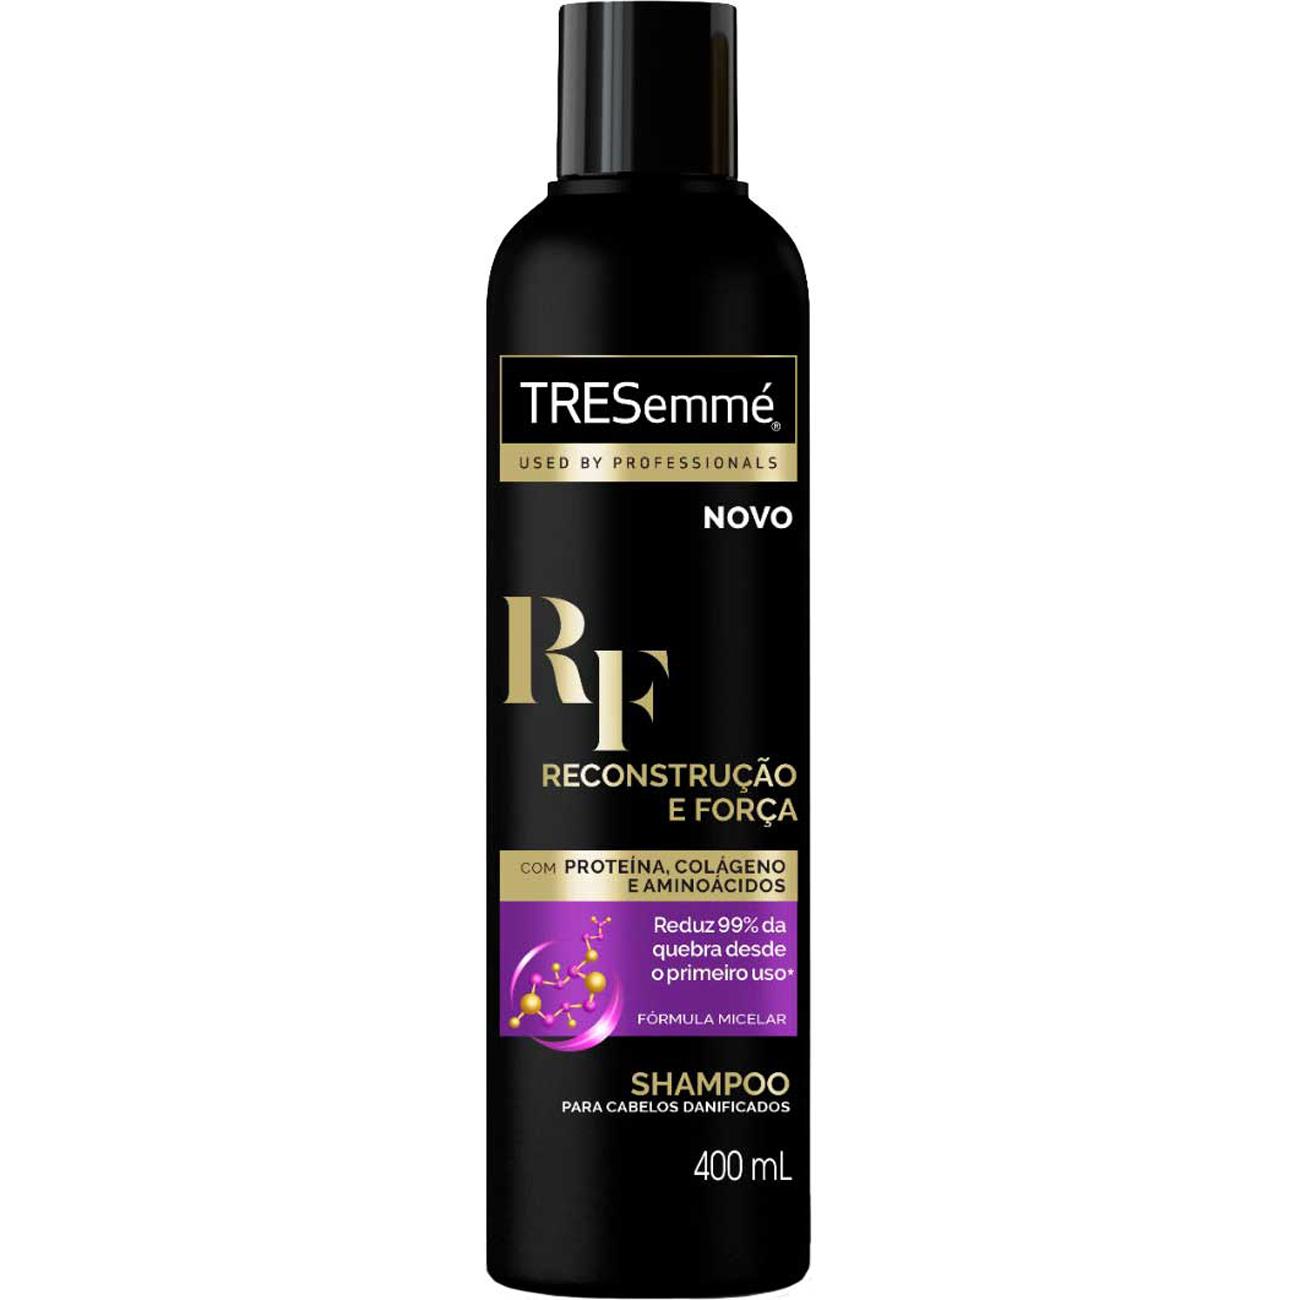 Shampoo Tresemme Reconstrucao E Forca 400Ml